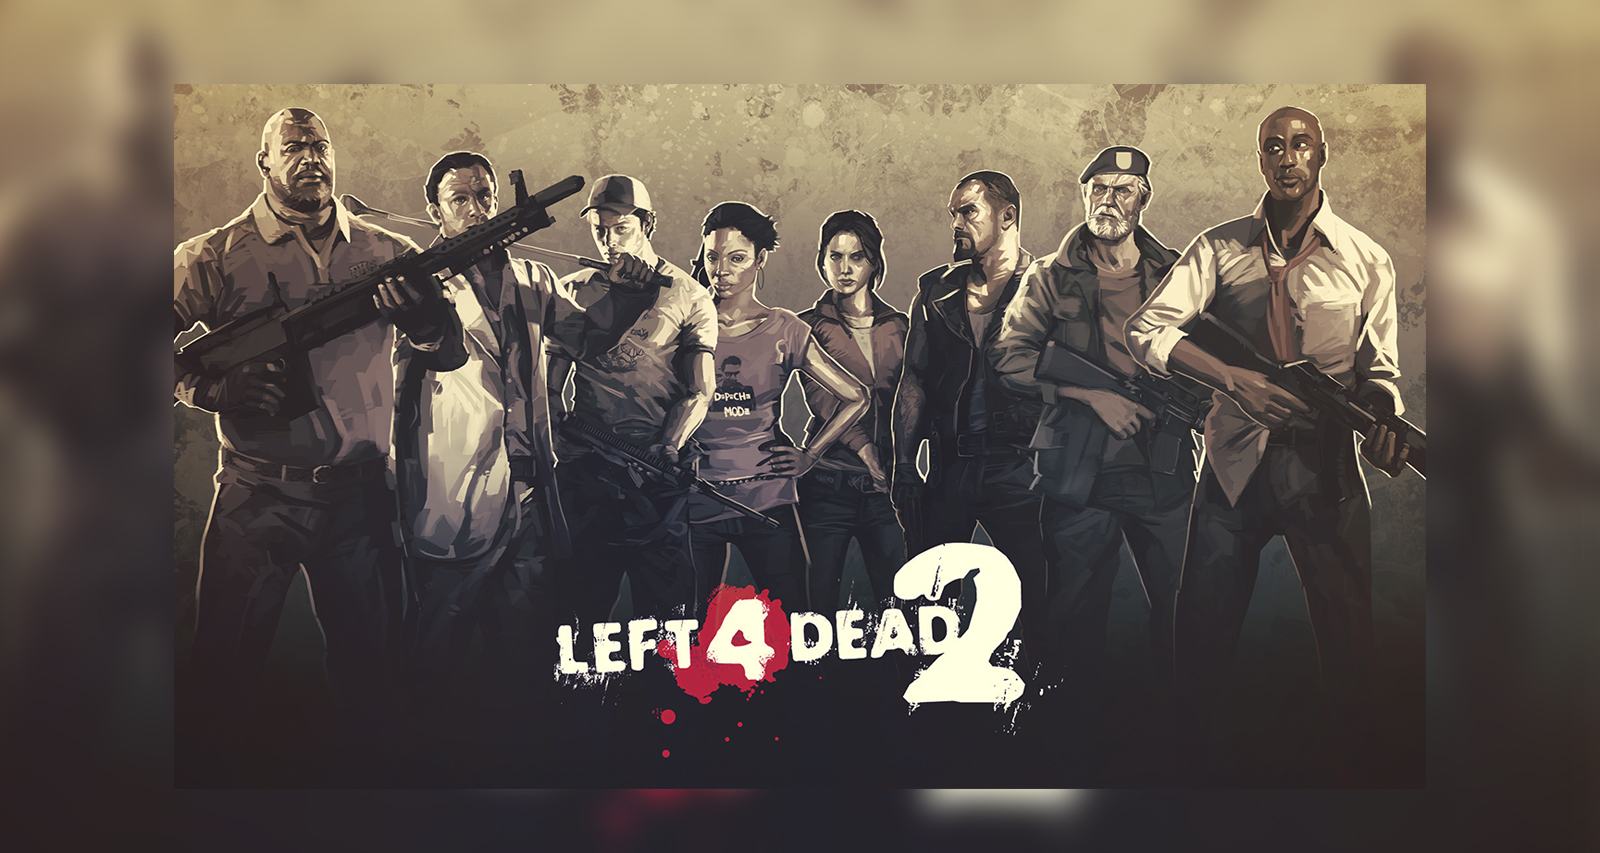 Left 4 Dead 2 v1.2.4.9 + ONLINE STEAM Edition PC Full Español 2017